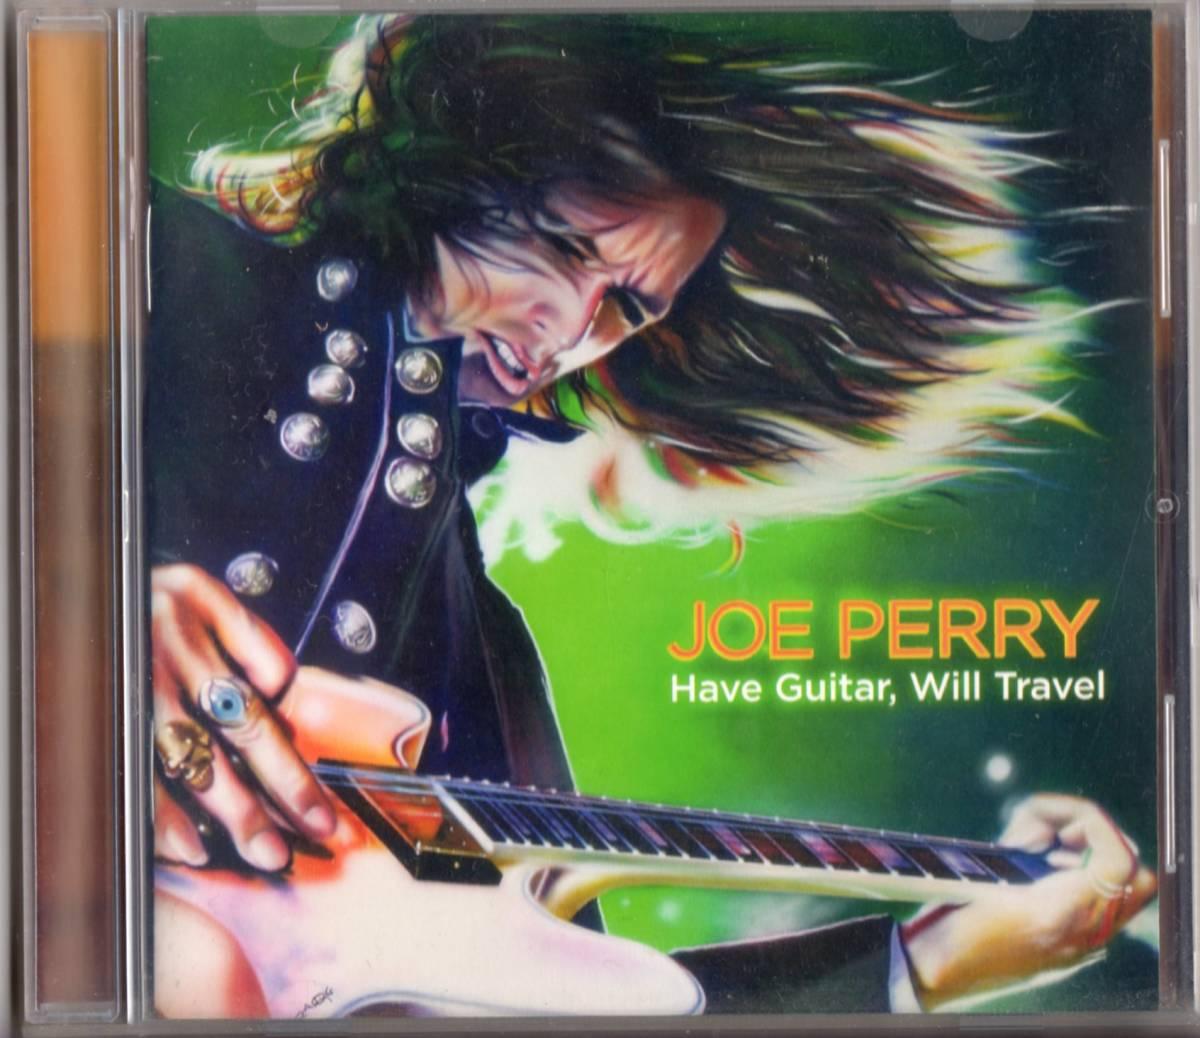 Joe Perryジョー・ペリー /Have Guitar, Will Travel【エアロスミスAerosmith関連ソロ】2009年_画像1